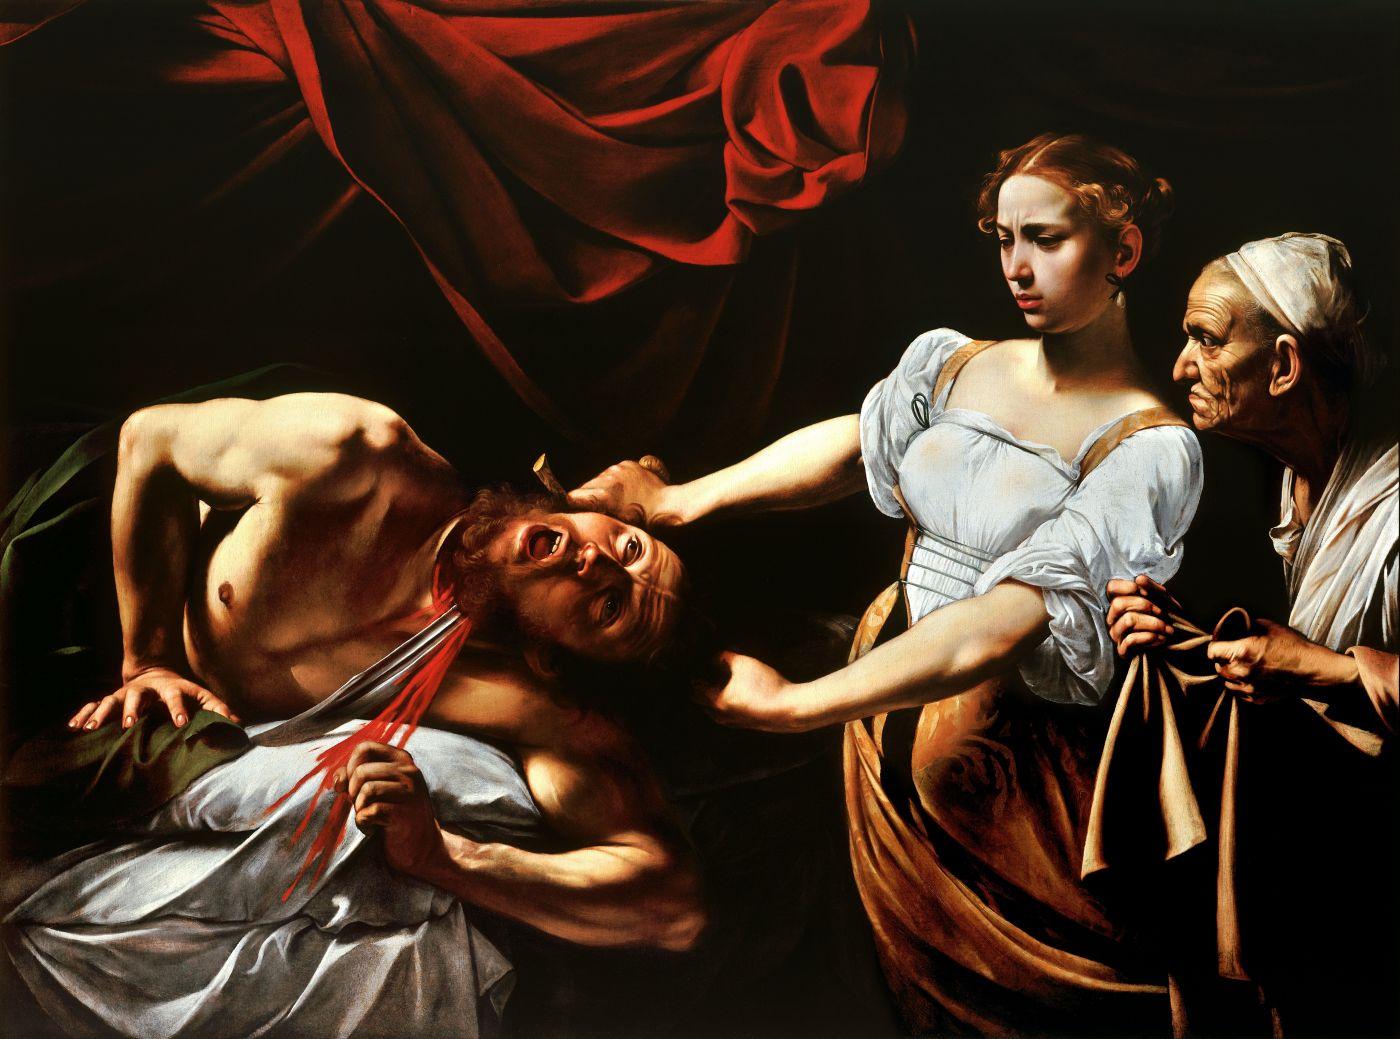 Judith_Beheading_Holofernes-Caravaggio_(